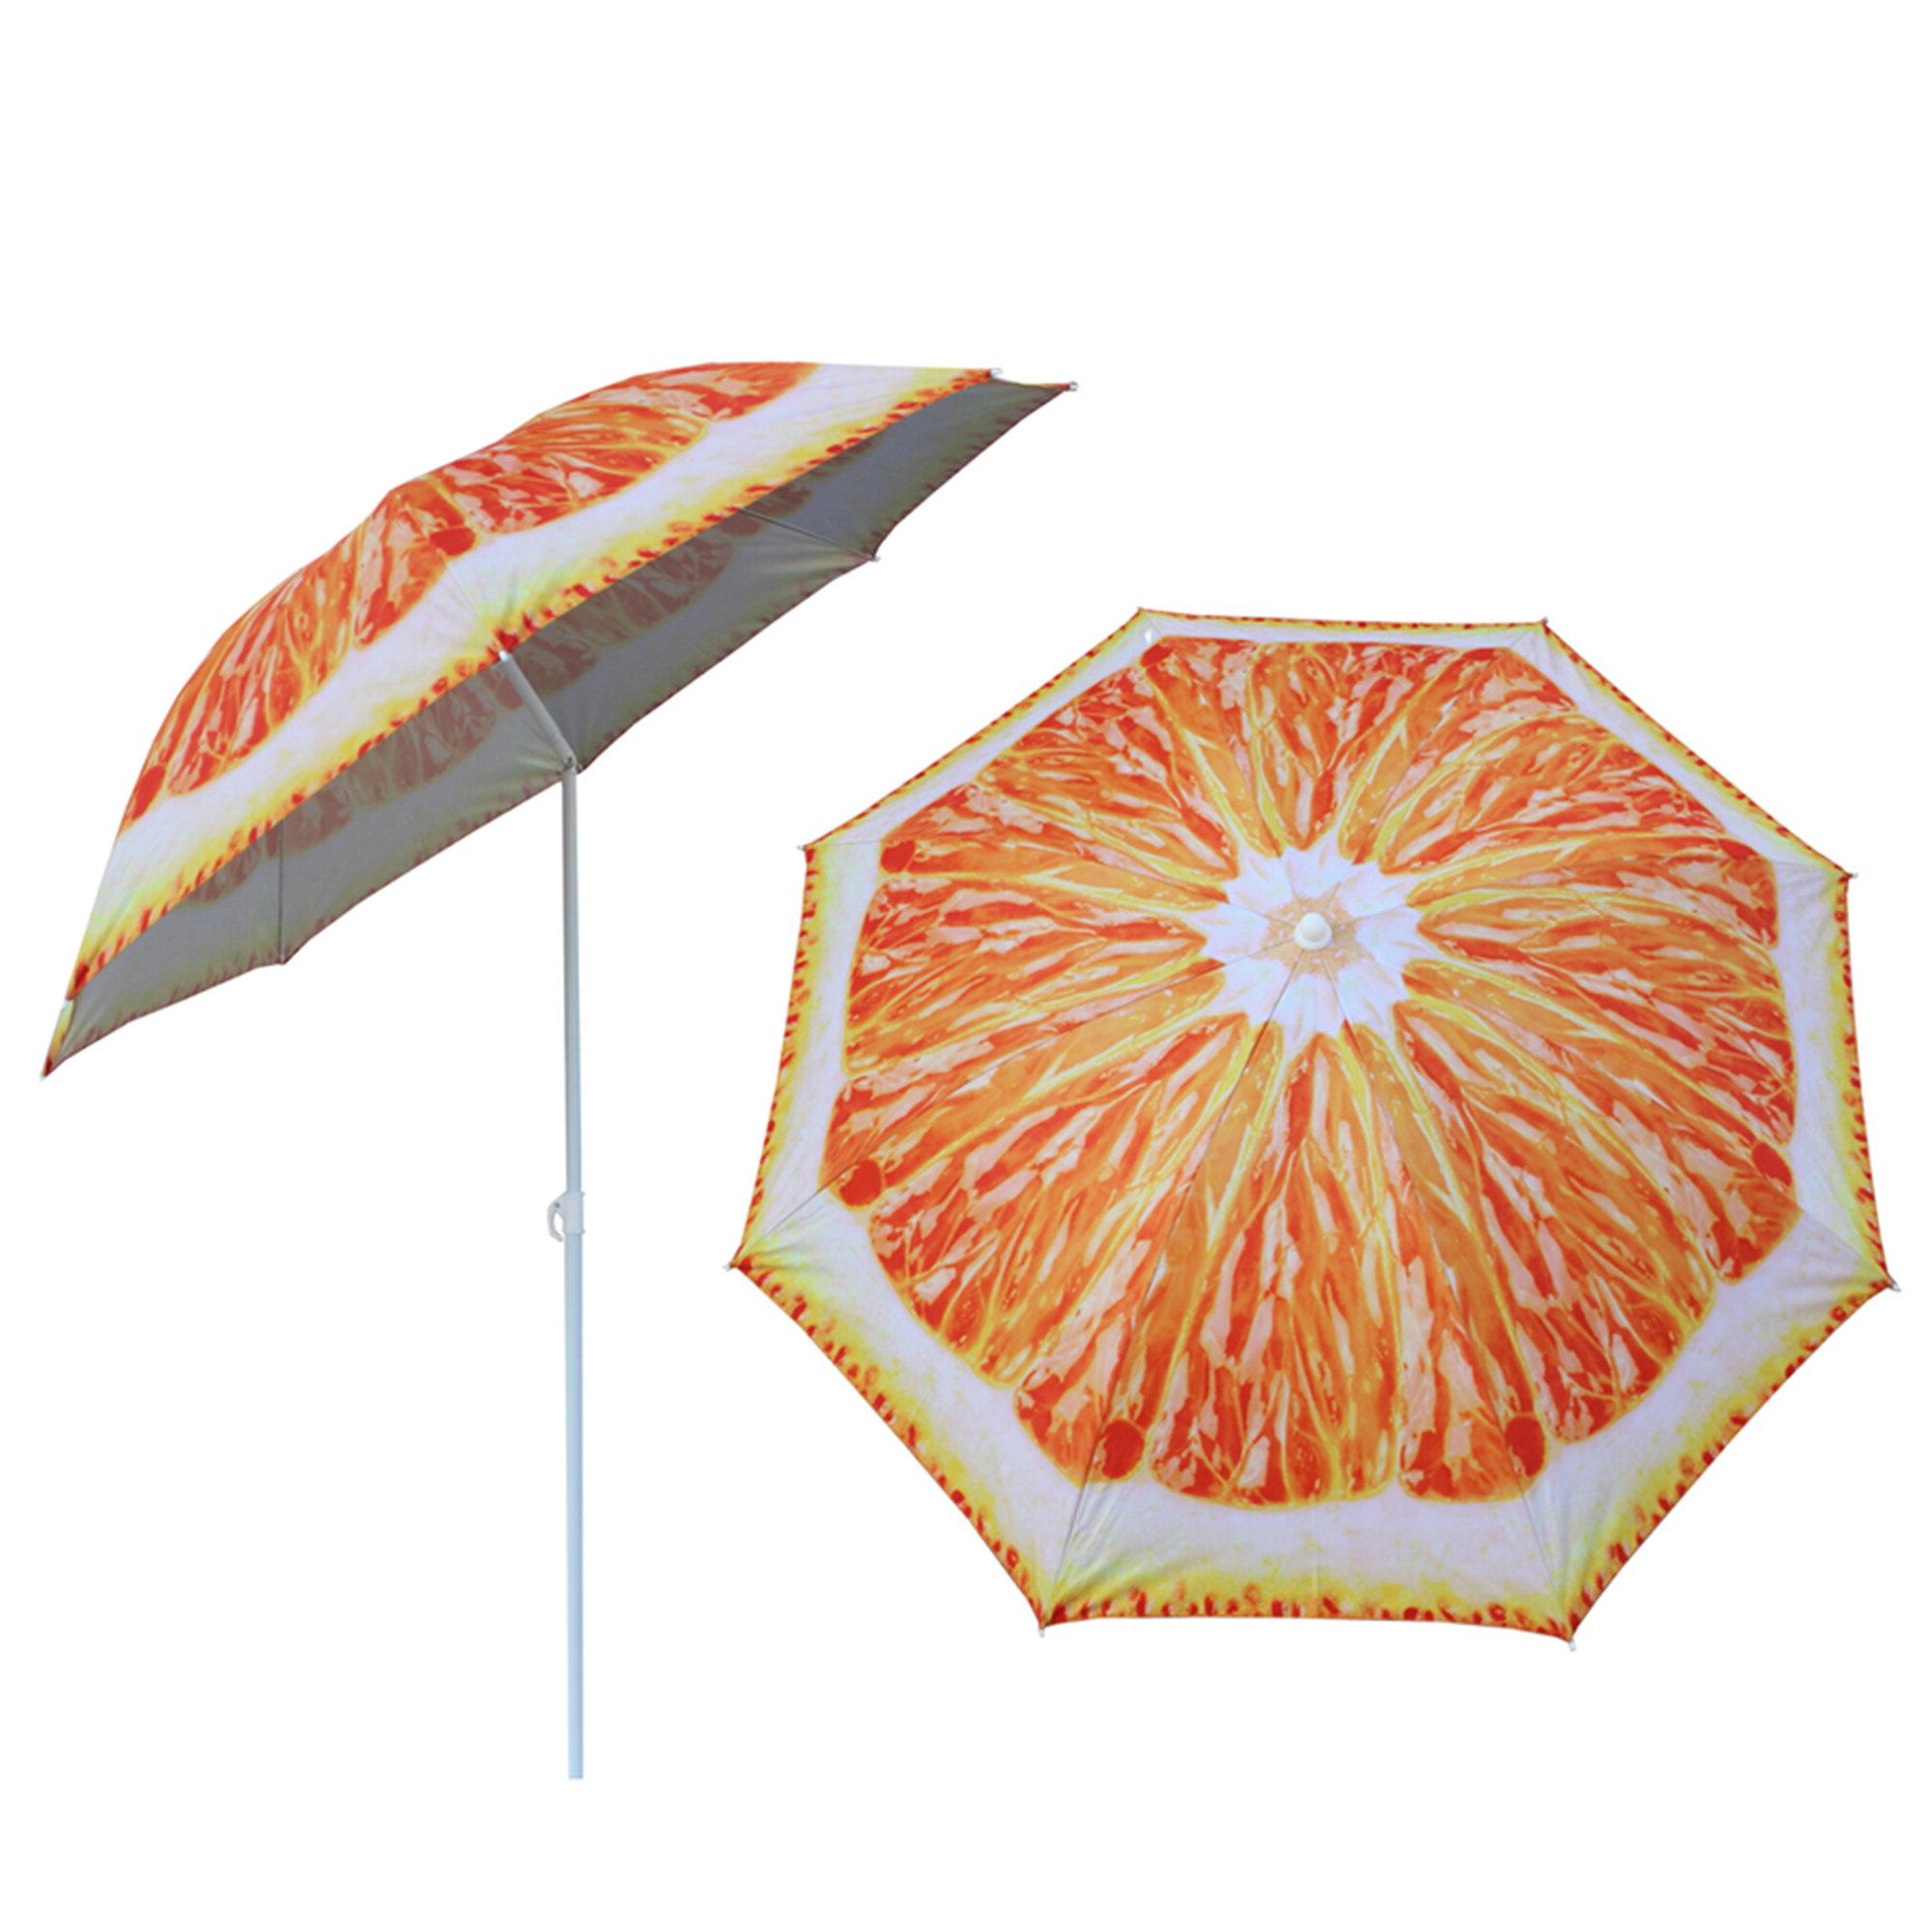 "Current Alyson Joeshade Beach Umbrellas With Regard To Zuniga 5'2"" Beach Umbrella (View 9 of 20)"